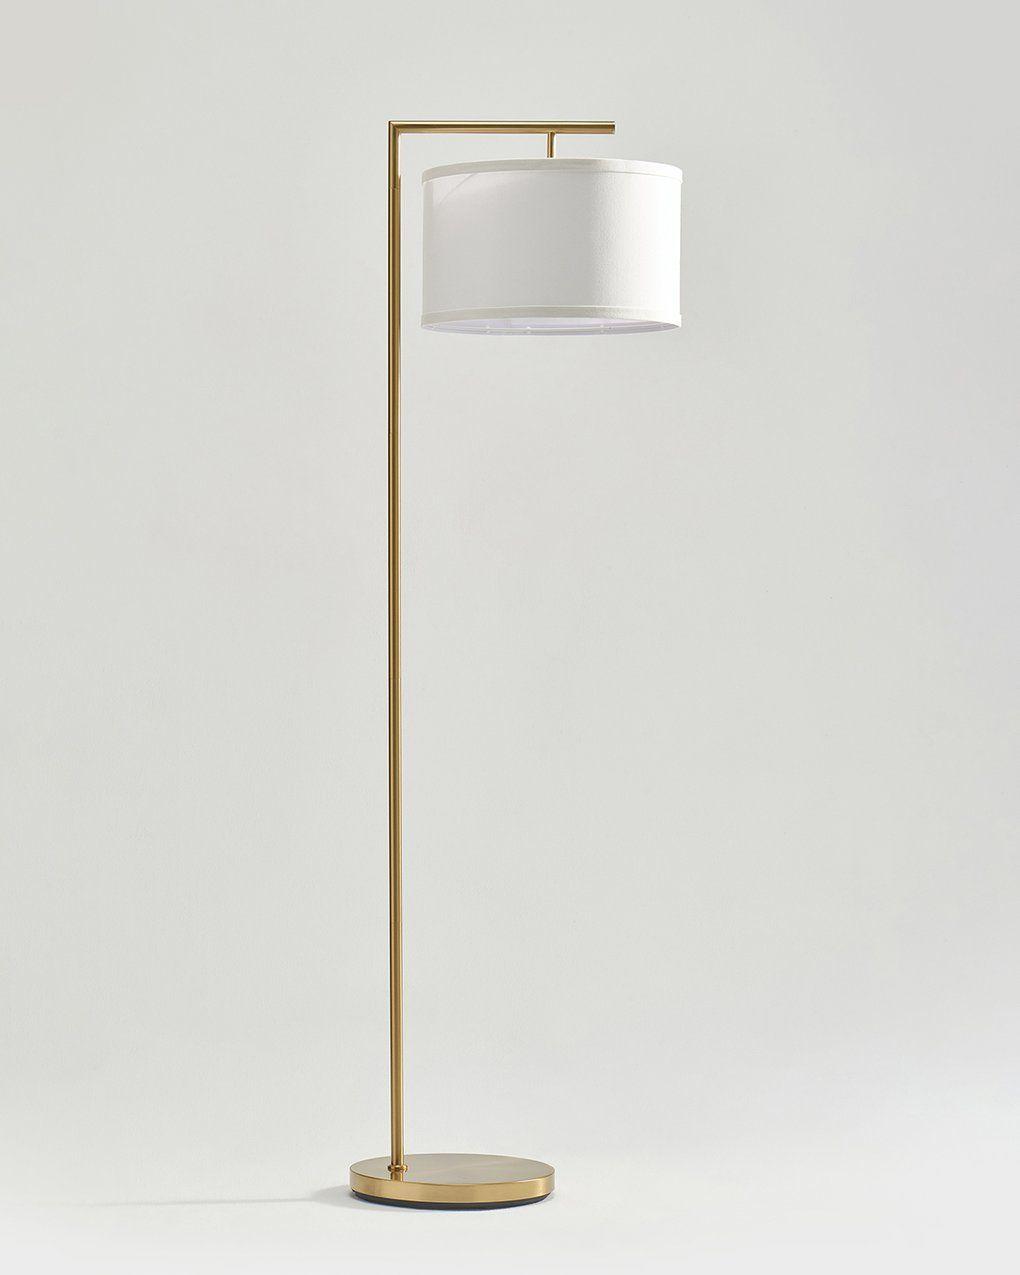 Montage Modern Floor Lamp In 2020 Modern Floor Lamps Black Floor Lamp Floor Lamp